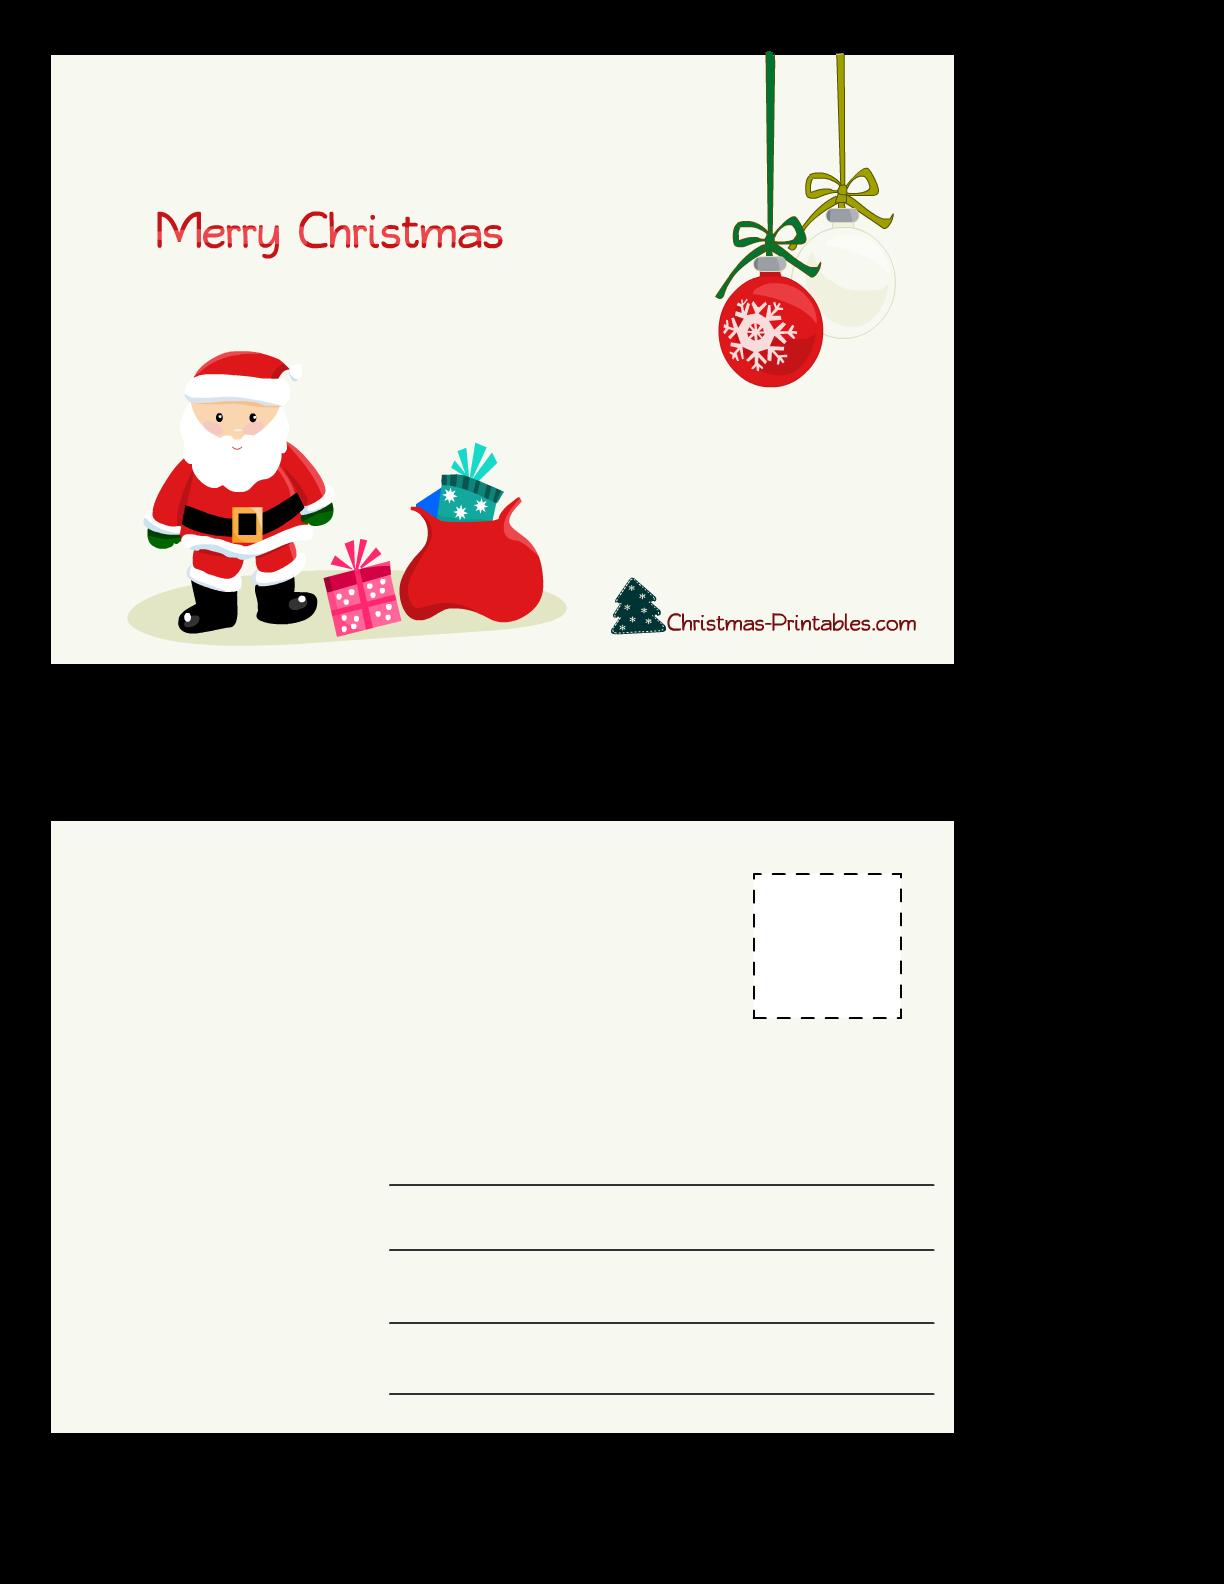 Free Christmas Printables!   Jellybean Junkyard  Cute Printable Holiday Cards